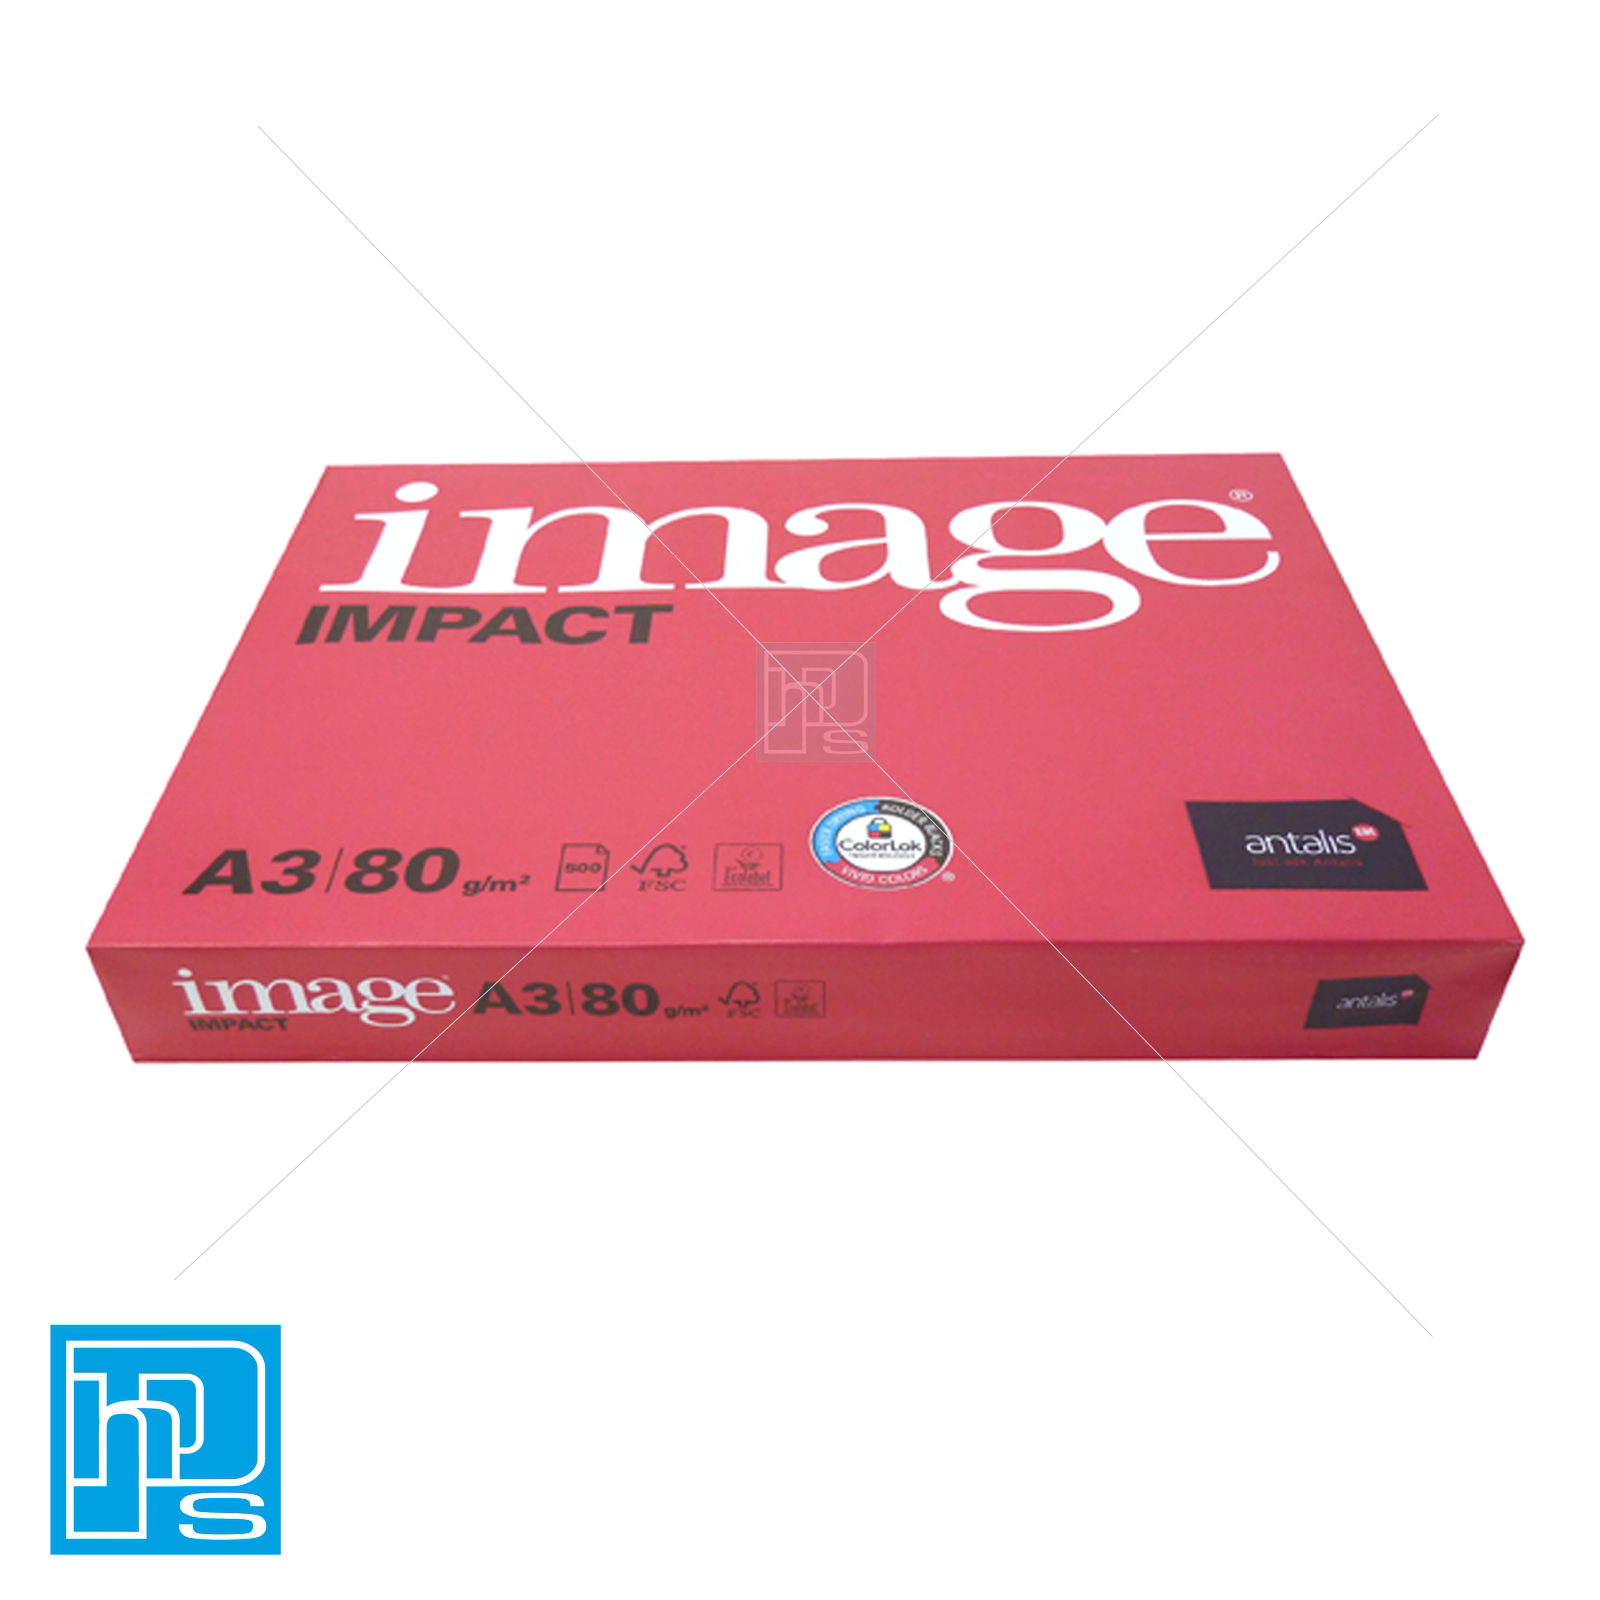 Image impact A3 paper